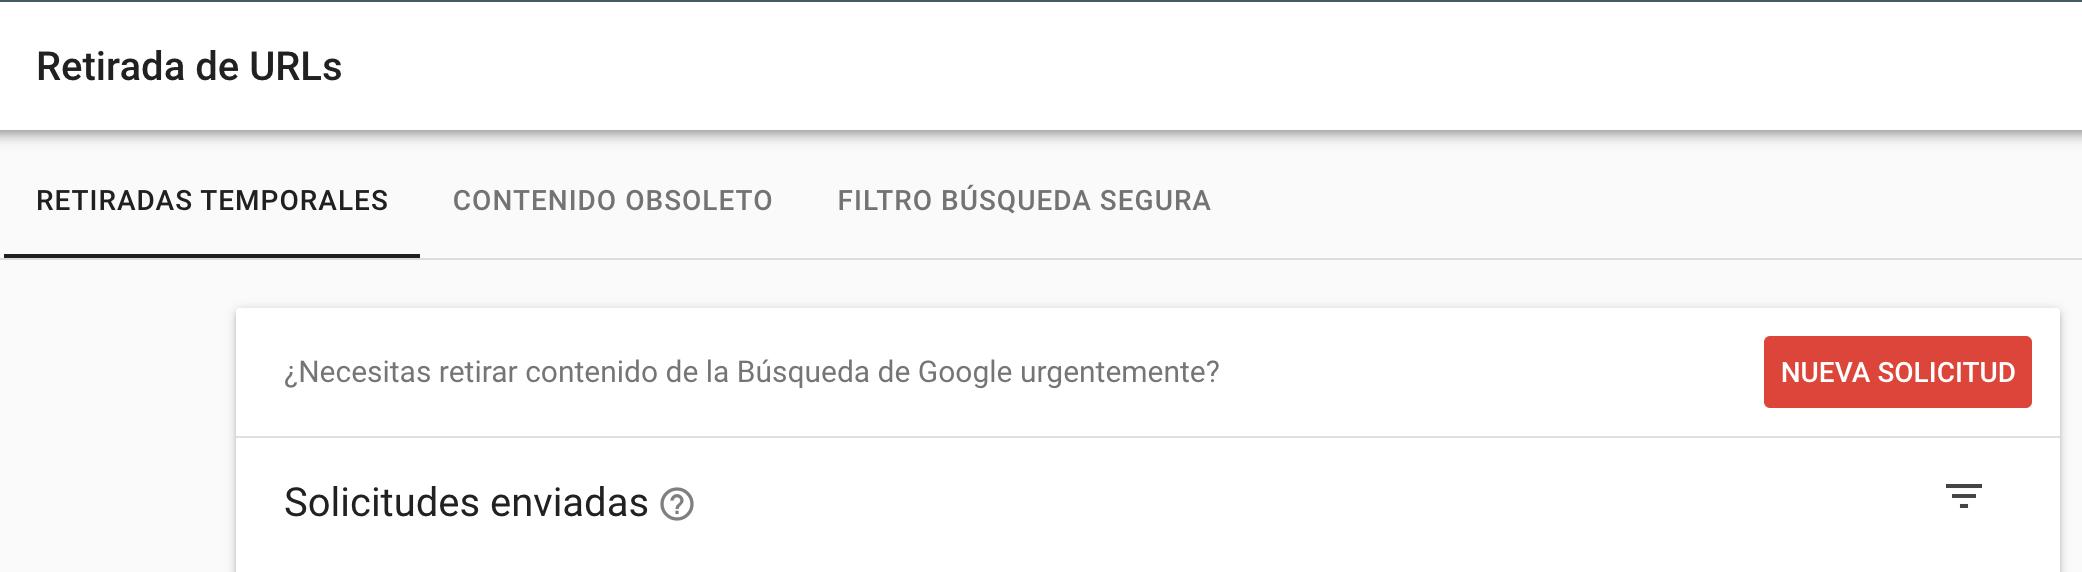 Google Search Console Retirada URLS